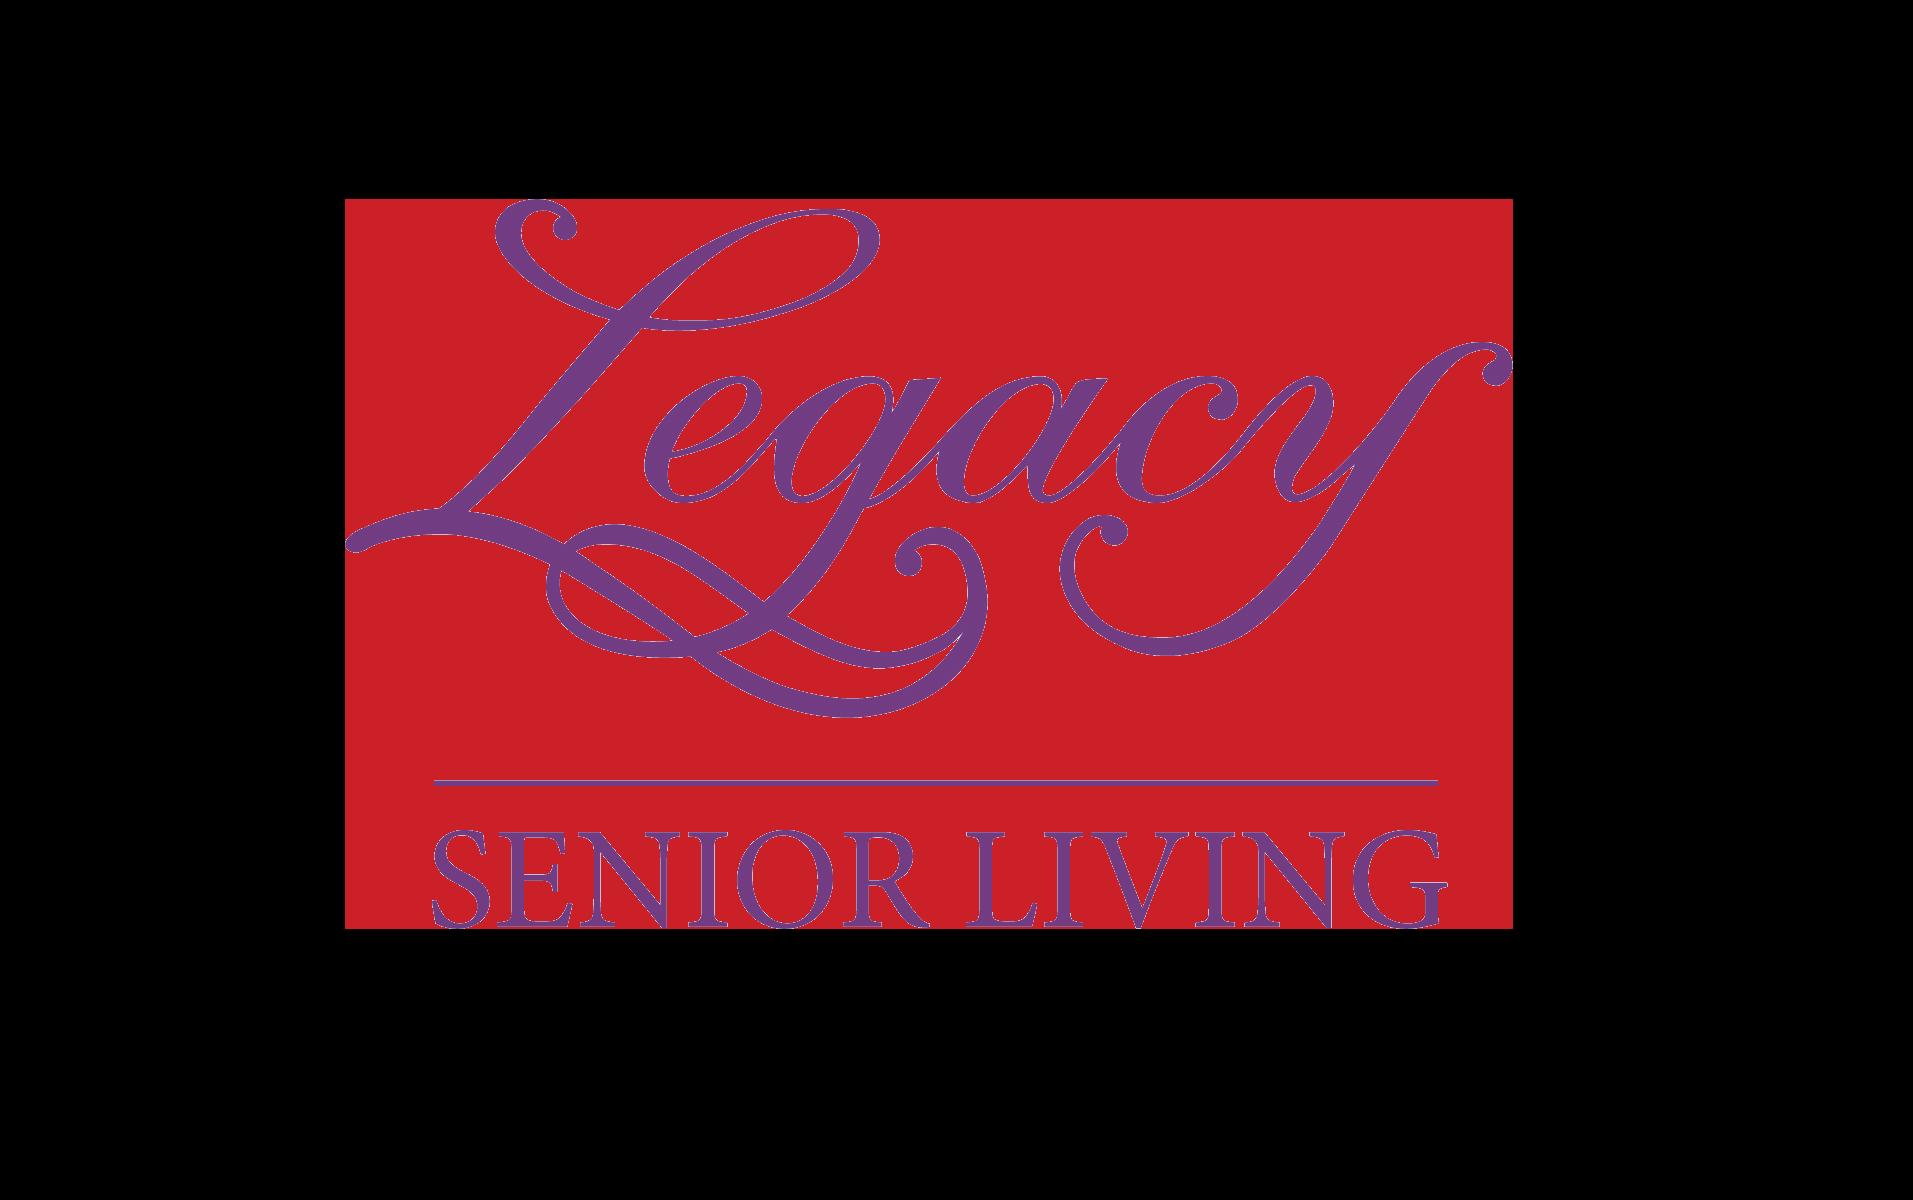 Marketing Manager, Legacy Senior Living